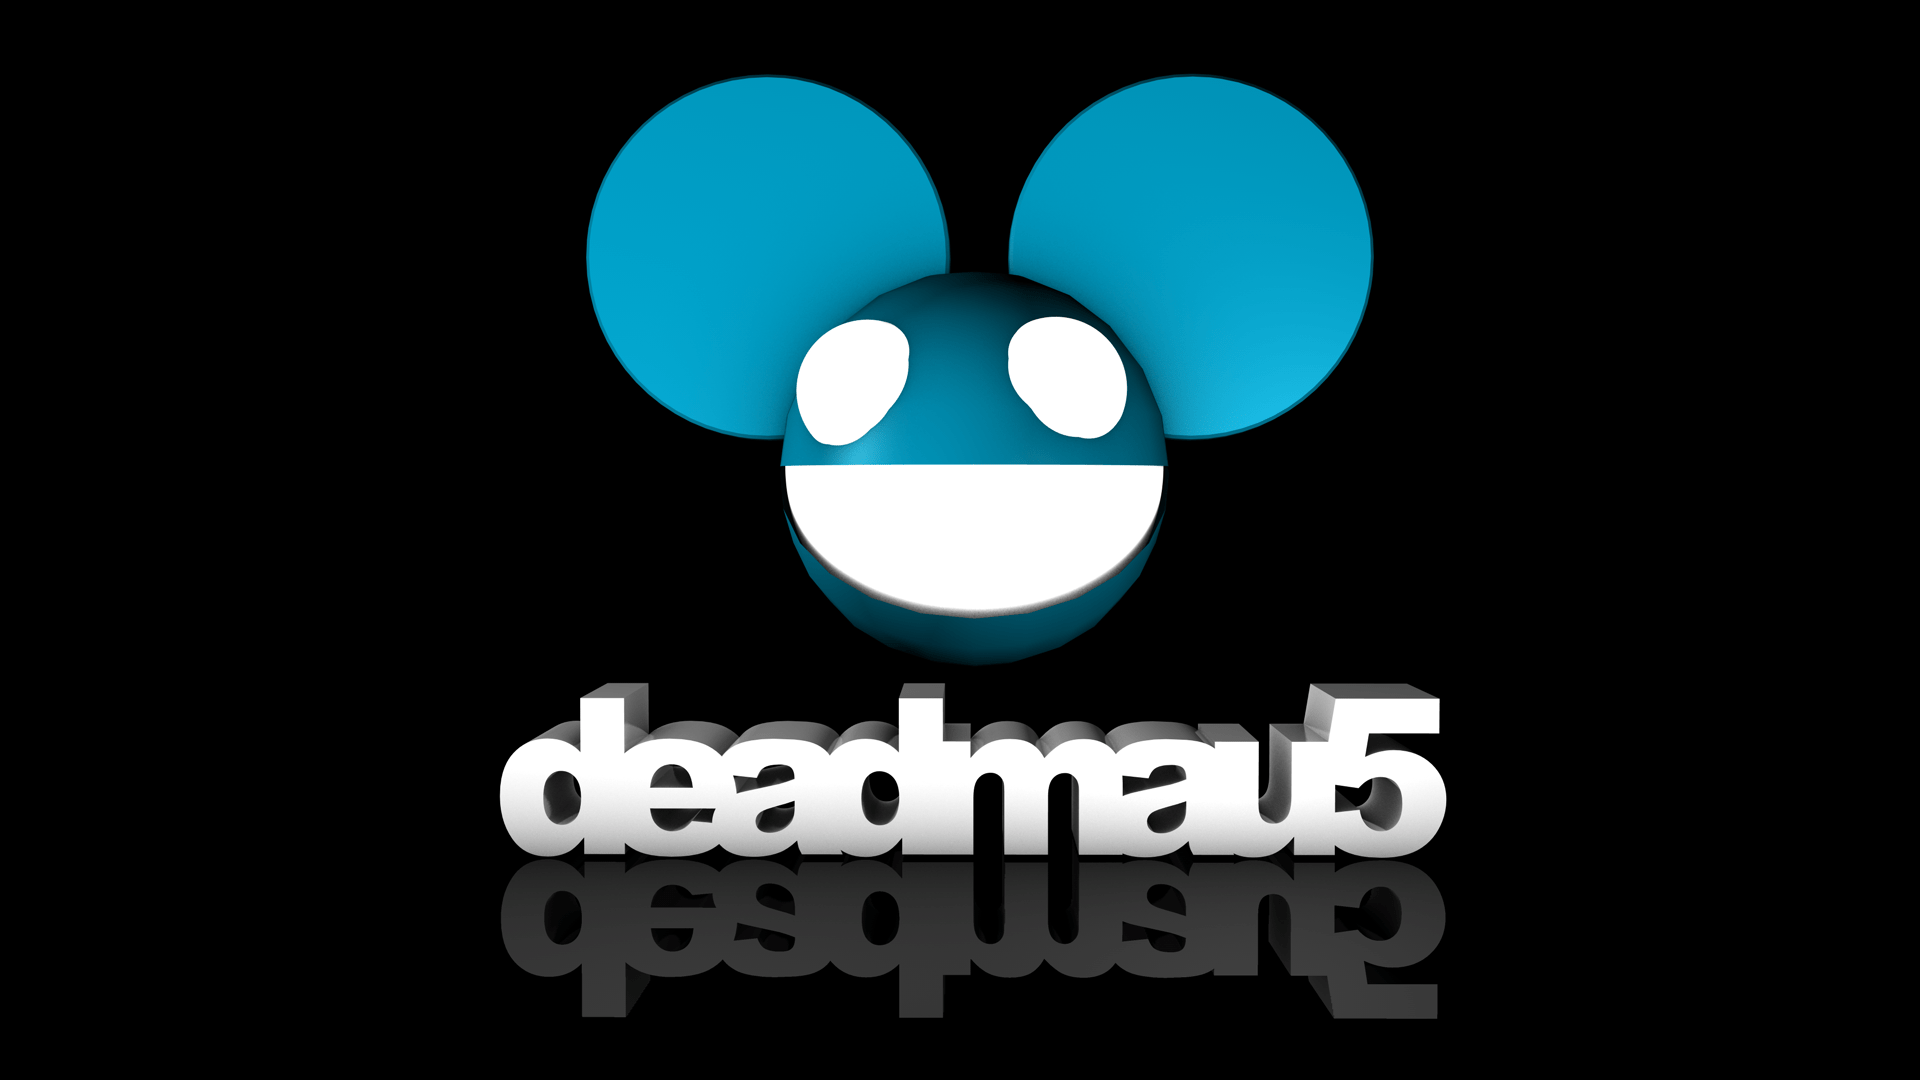 Anime Dubstep Wallpaper Deadmau5 Pictures Wallpup Com